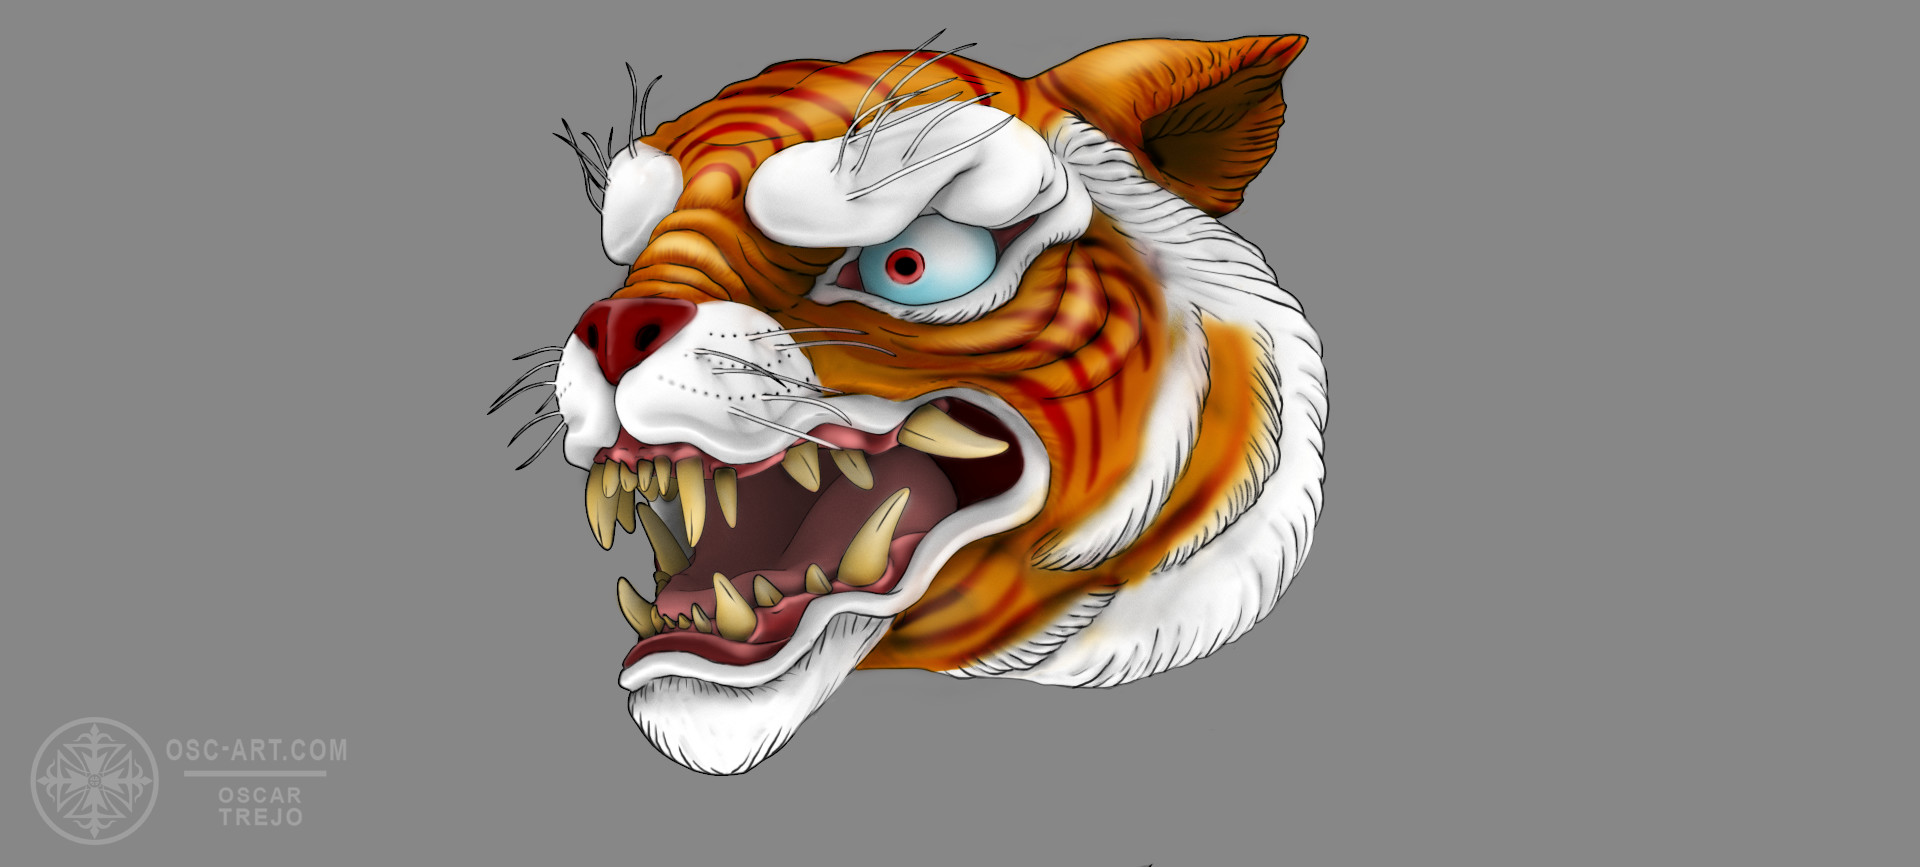 Oscar trejo tiger toon2